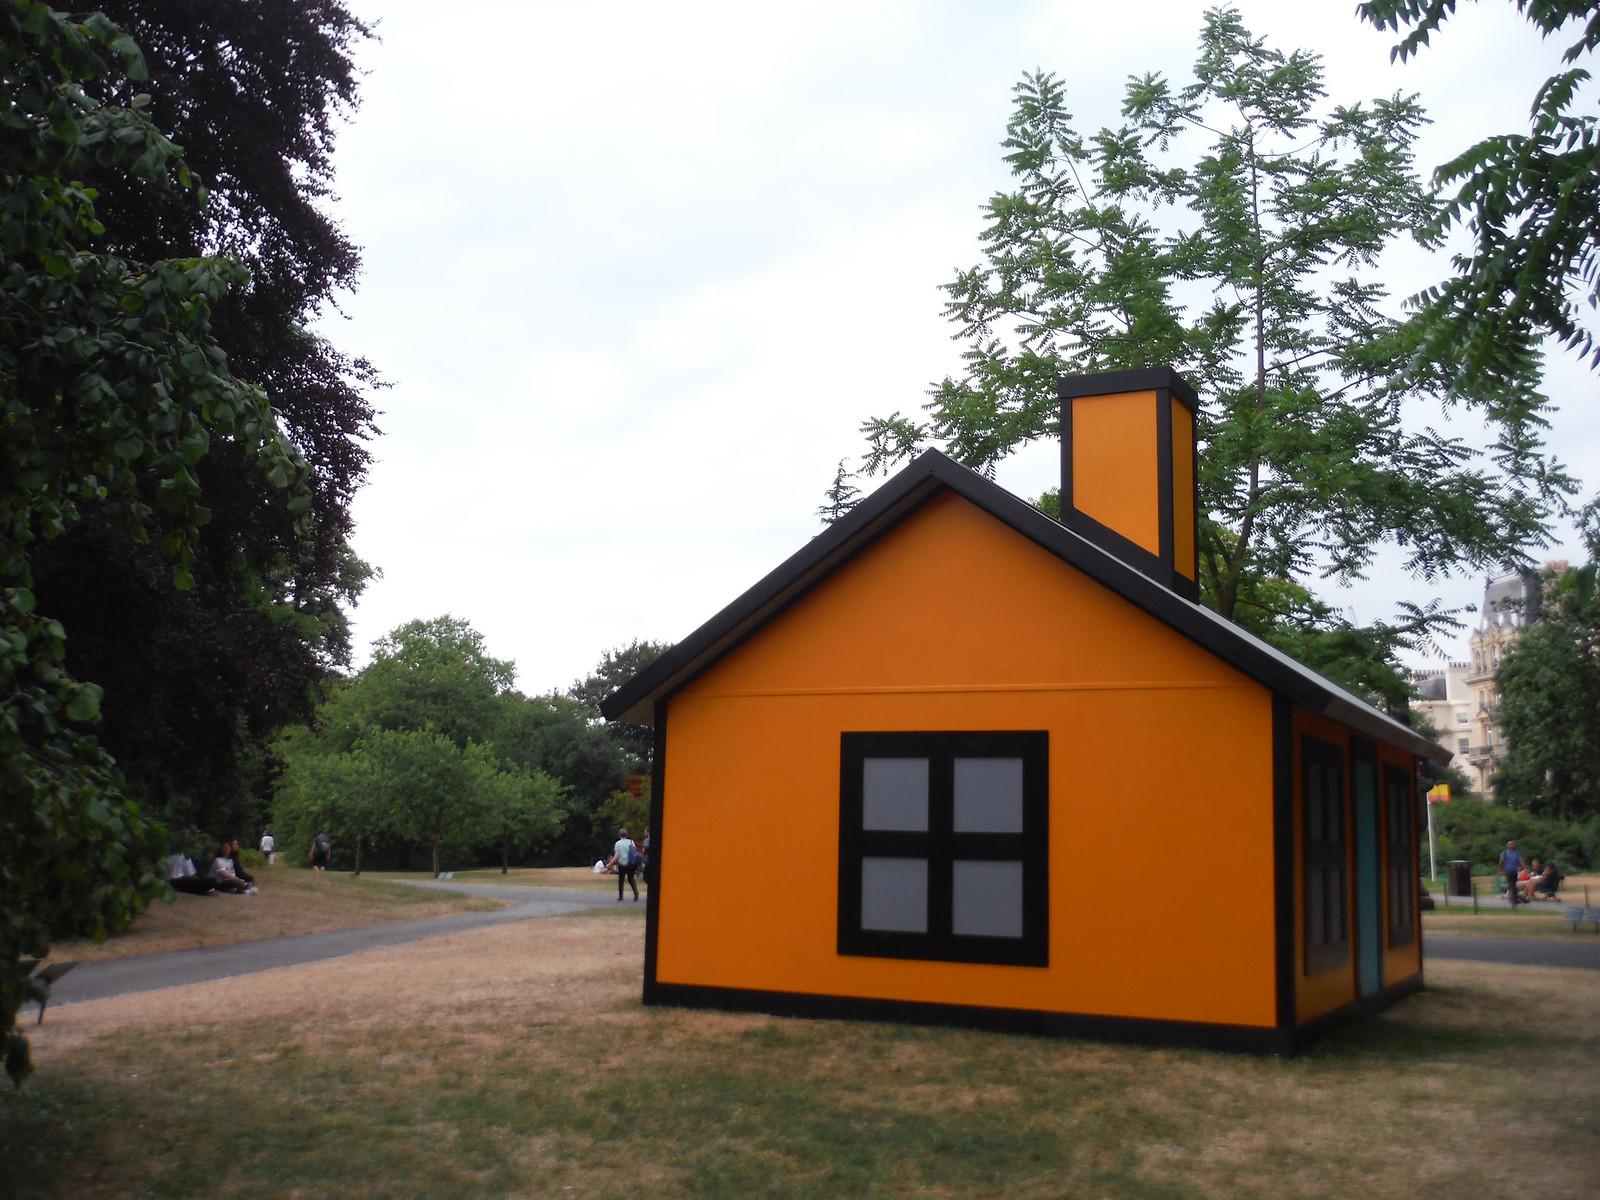 Frieze Sculpture Park 2018: Richard Woods, 'Holiday Home (Regent's Park)' SWC Short Walk 6 - Regent's Park and Primrose Hill